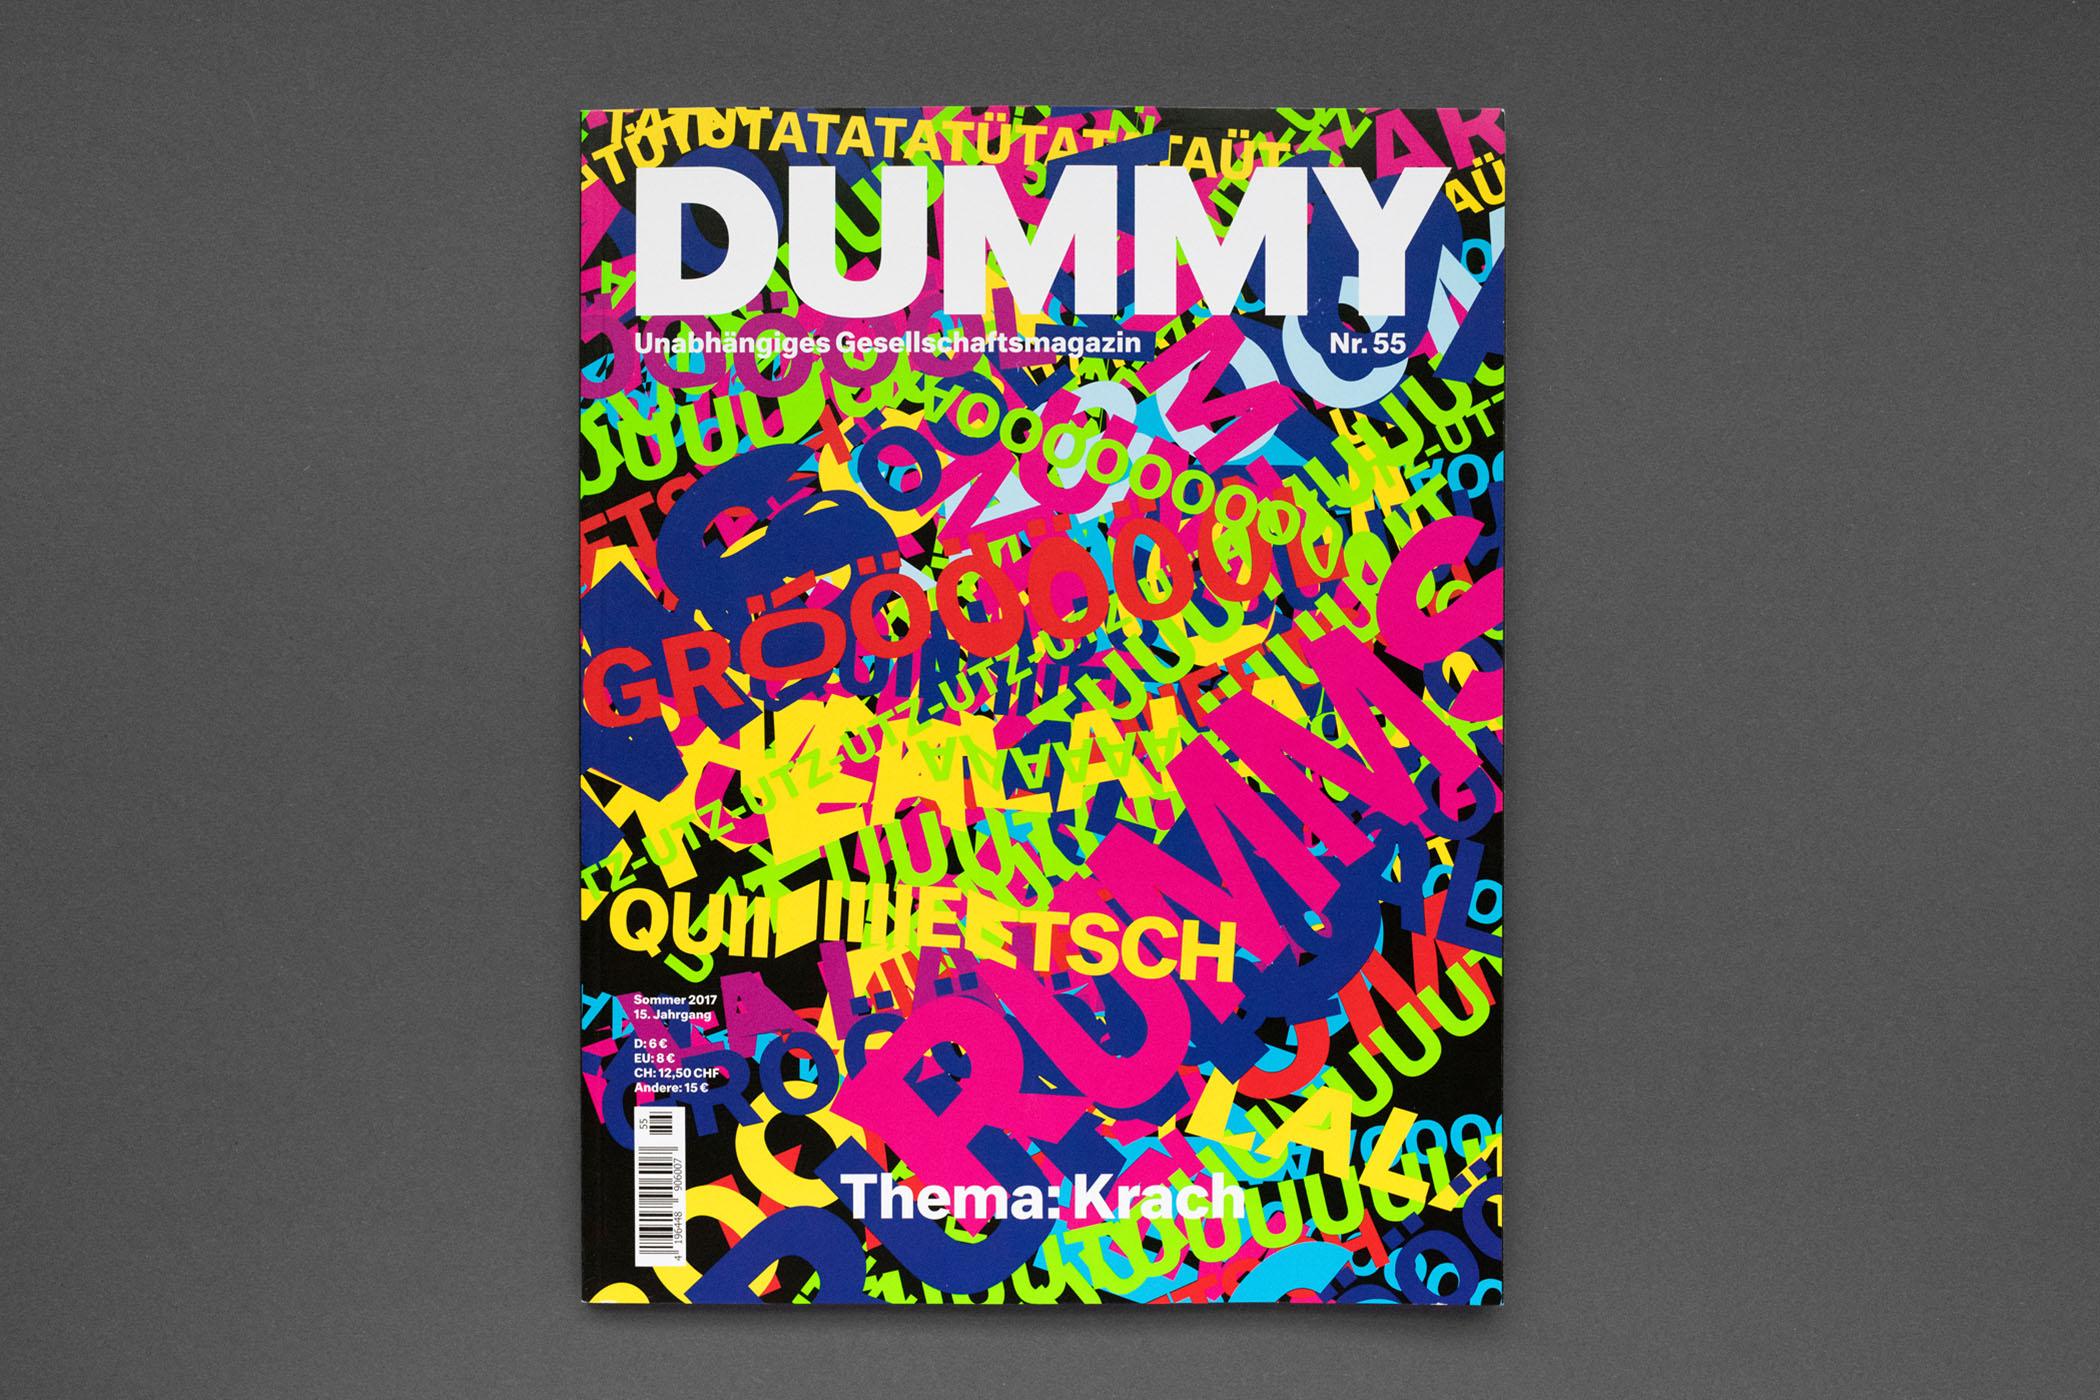 Dummy No. 55